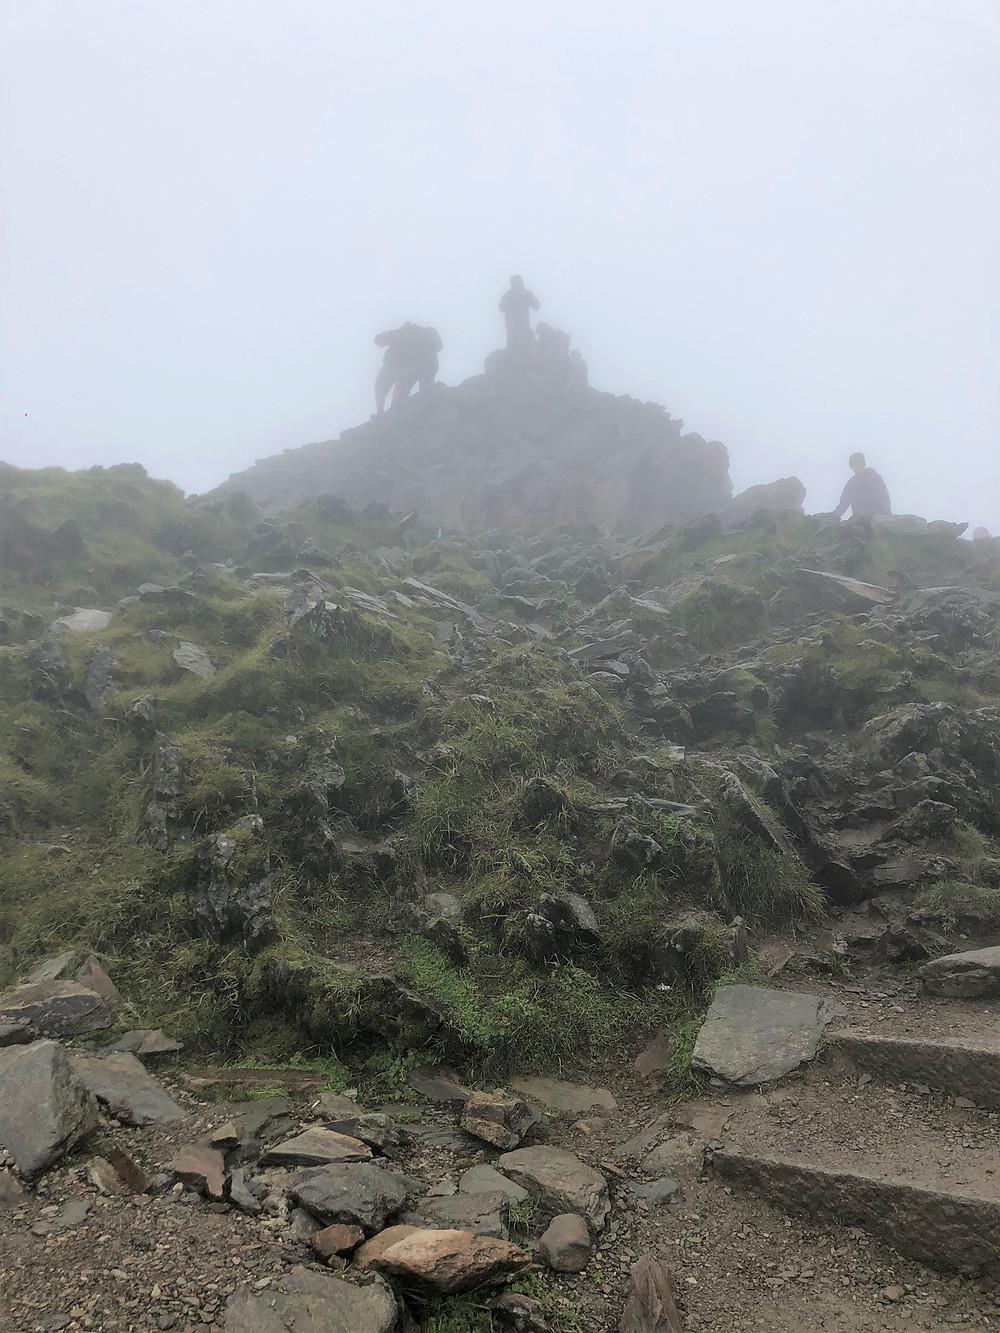 Snowdon summit covered n clouds.  Few people on Snowdon summit